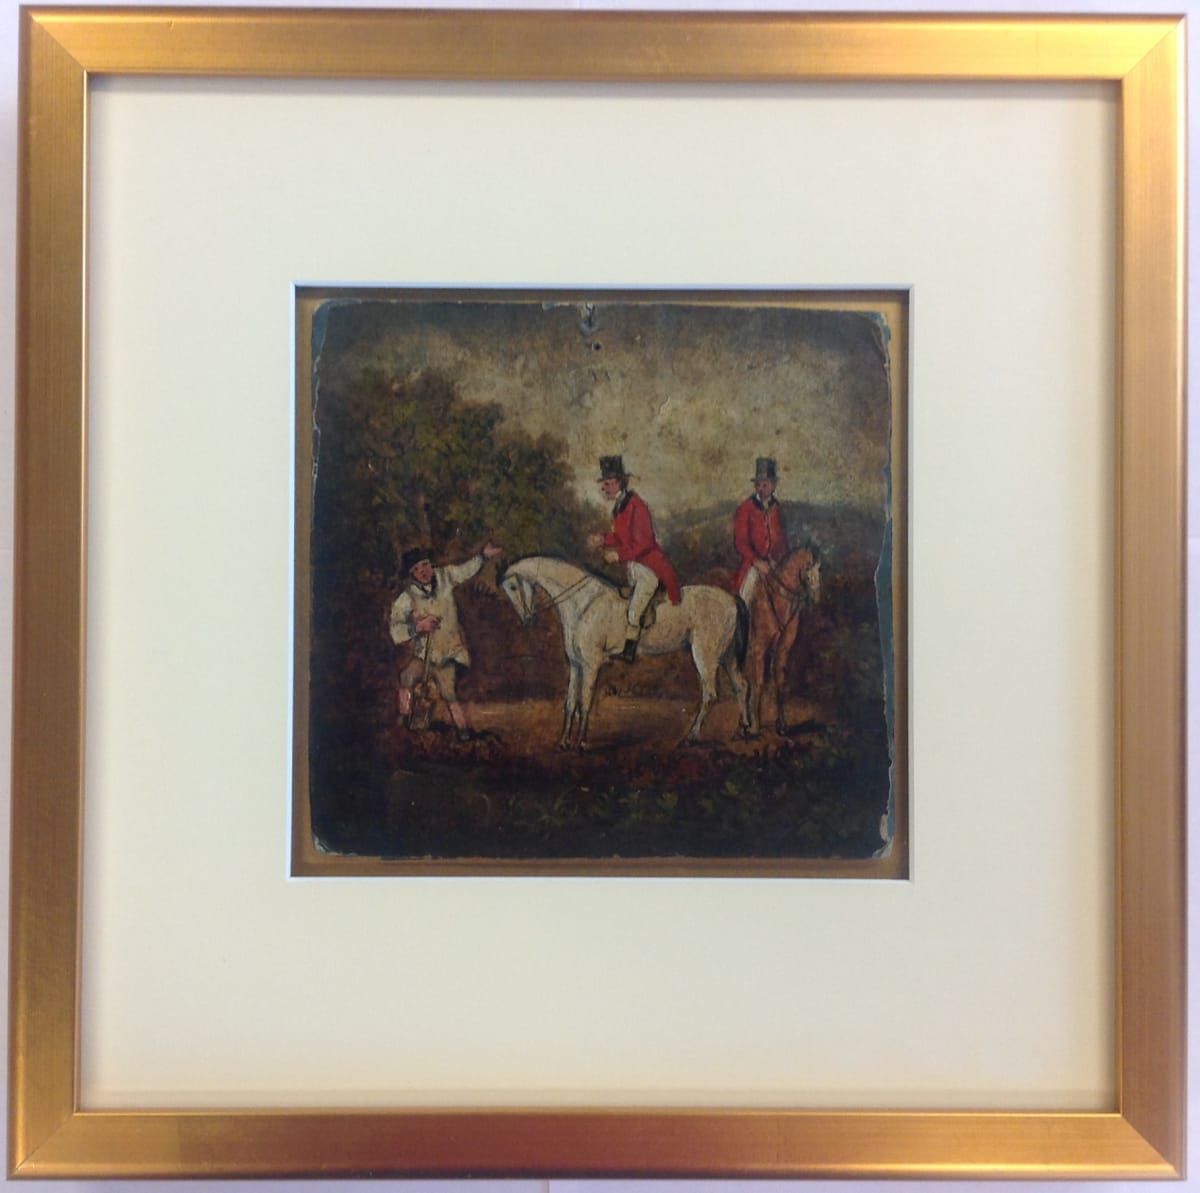 2612 - Lane Riders by Stephen Jenner (1794 - 1881) Grand-Nephew of Dr. Edward Jenner